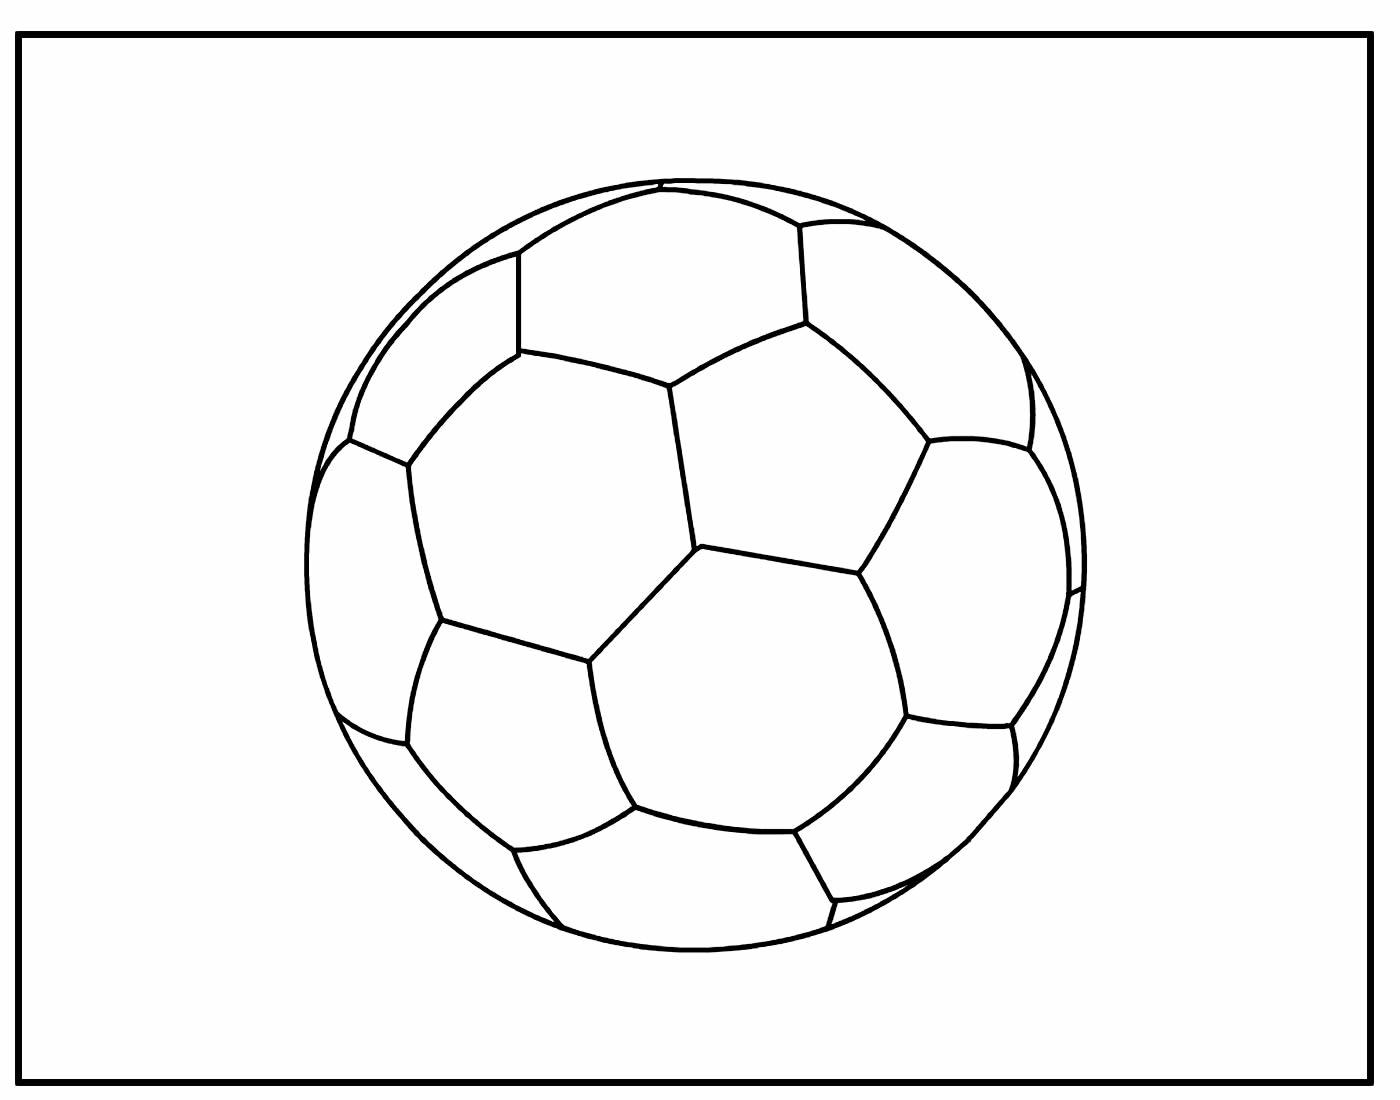 Página para colorir de Bola de Futebol